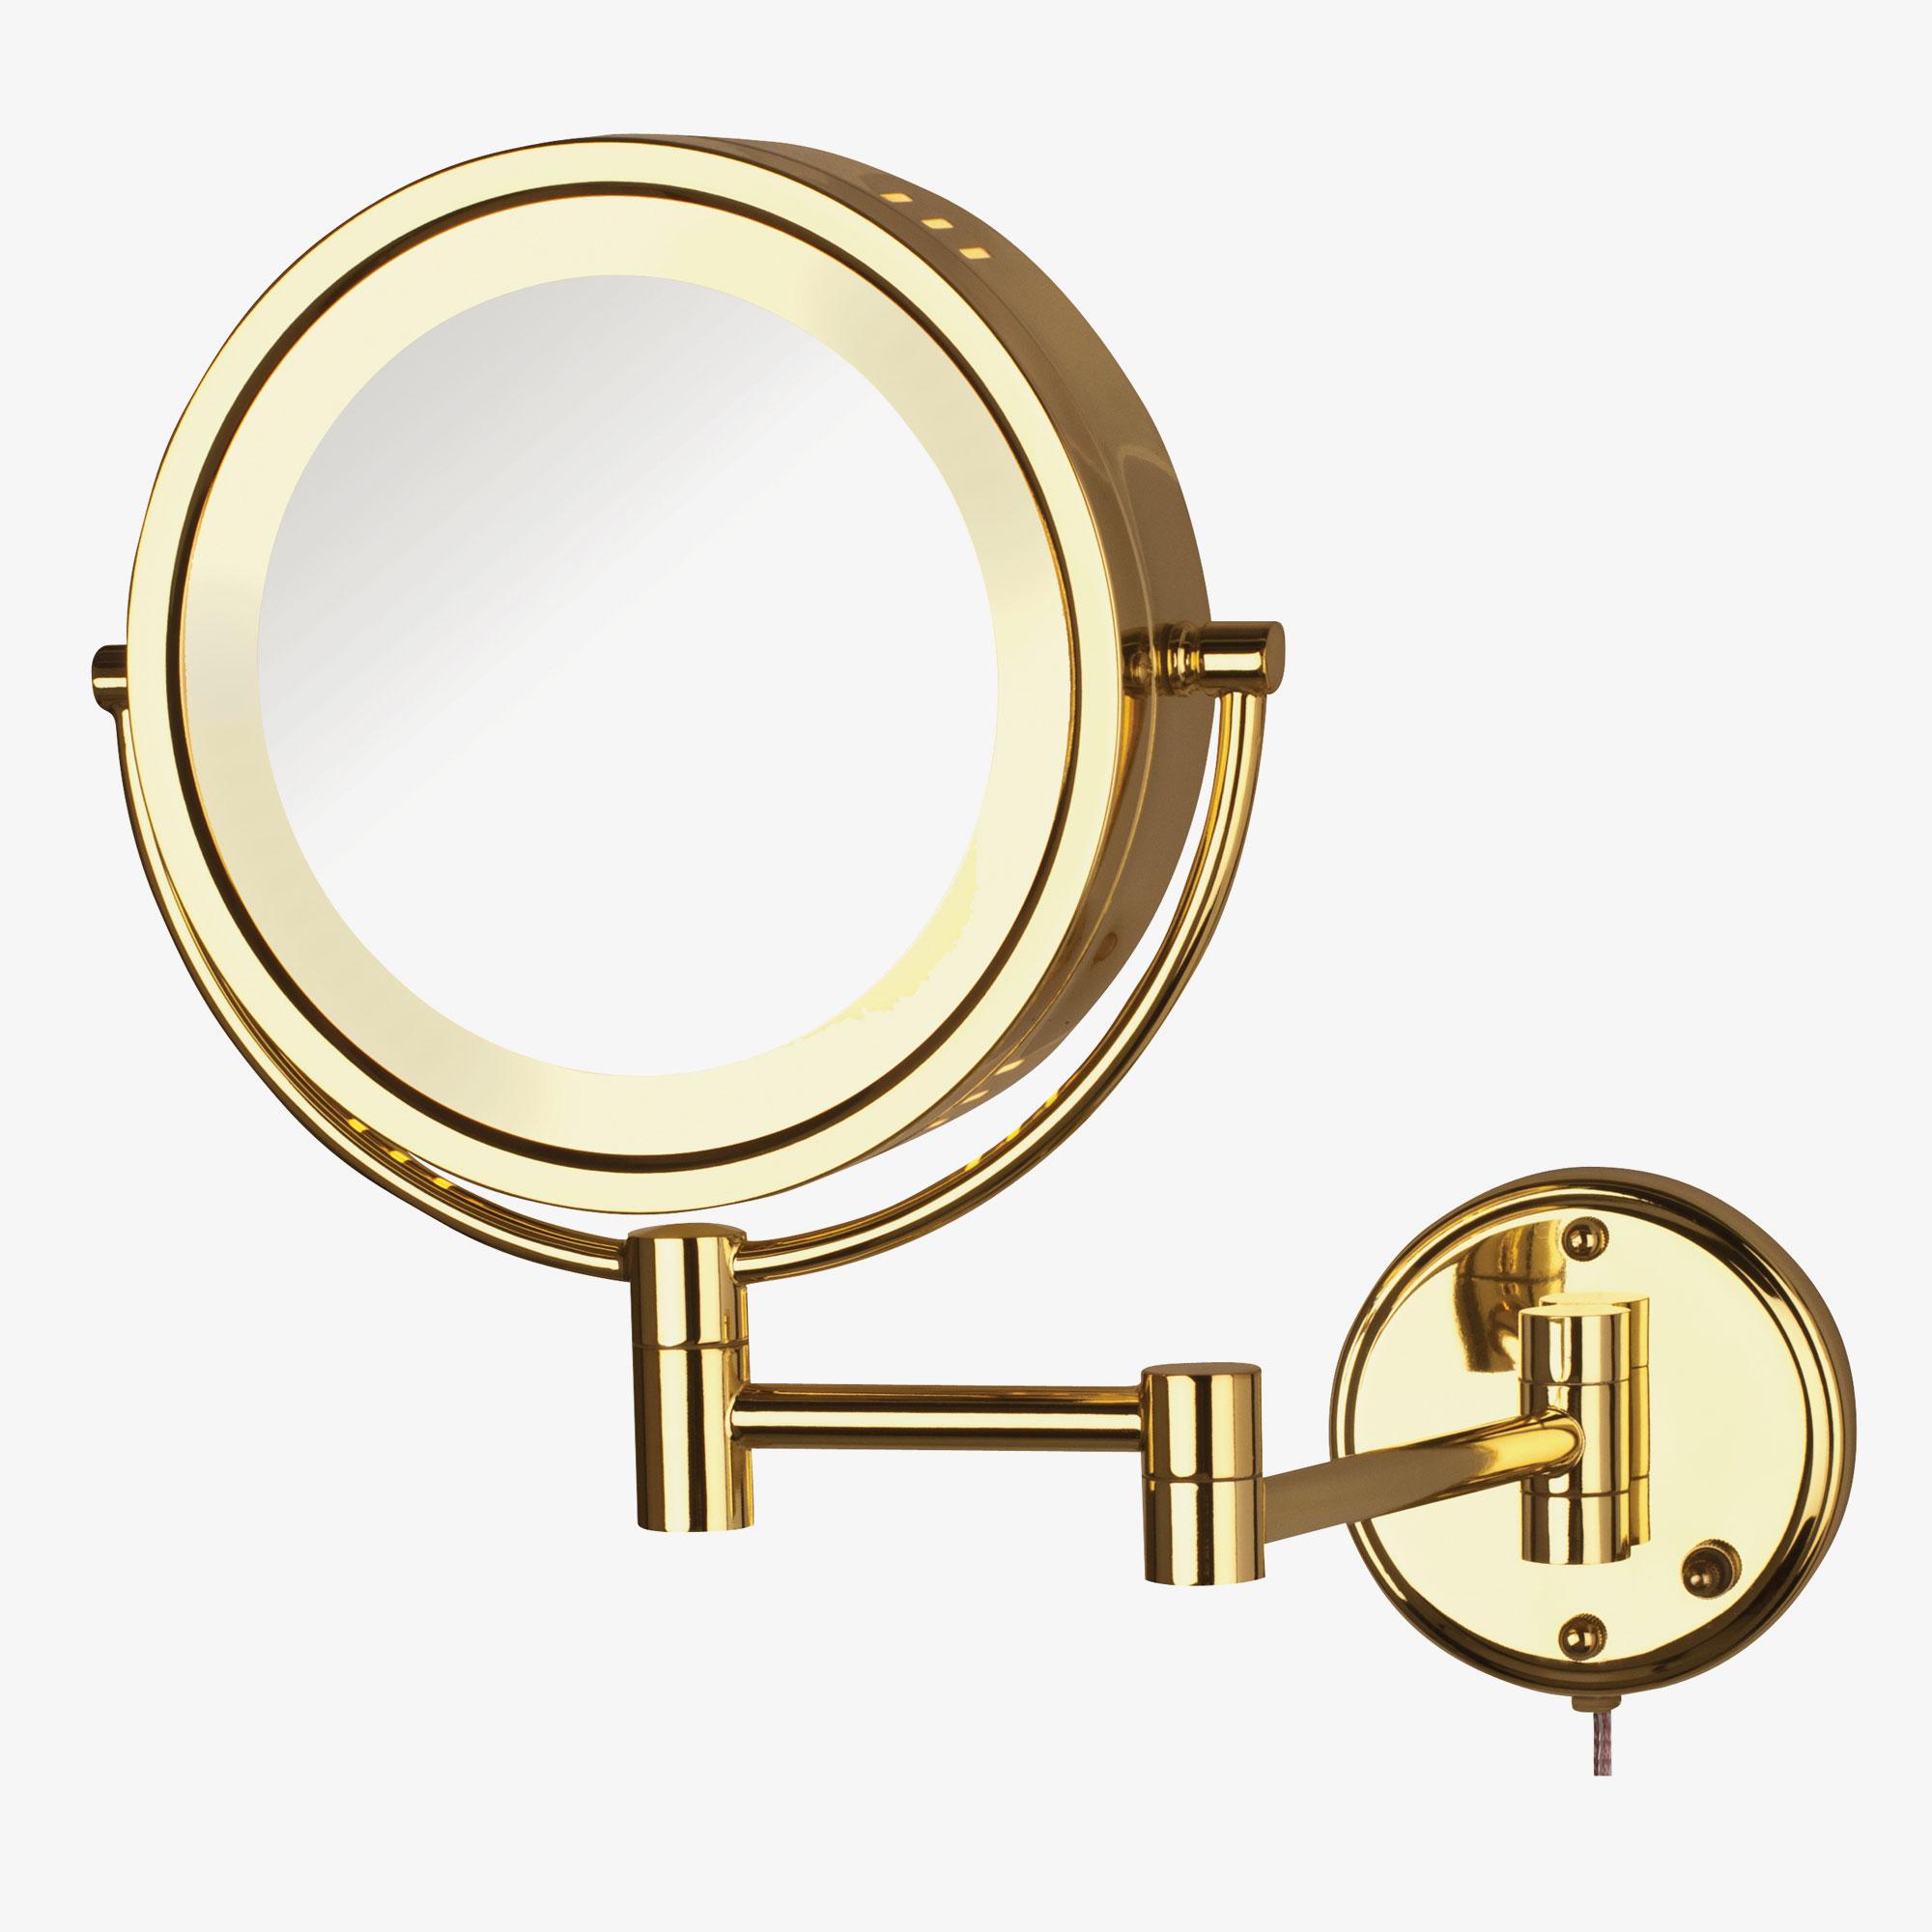 jerdon hl75g 8 5 lighted wall mount mirror 1x 8x. Black Bedroom Furniture Sets. Home Design Ideas